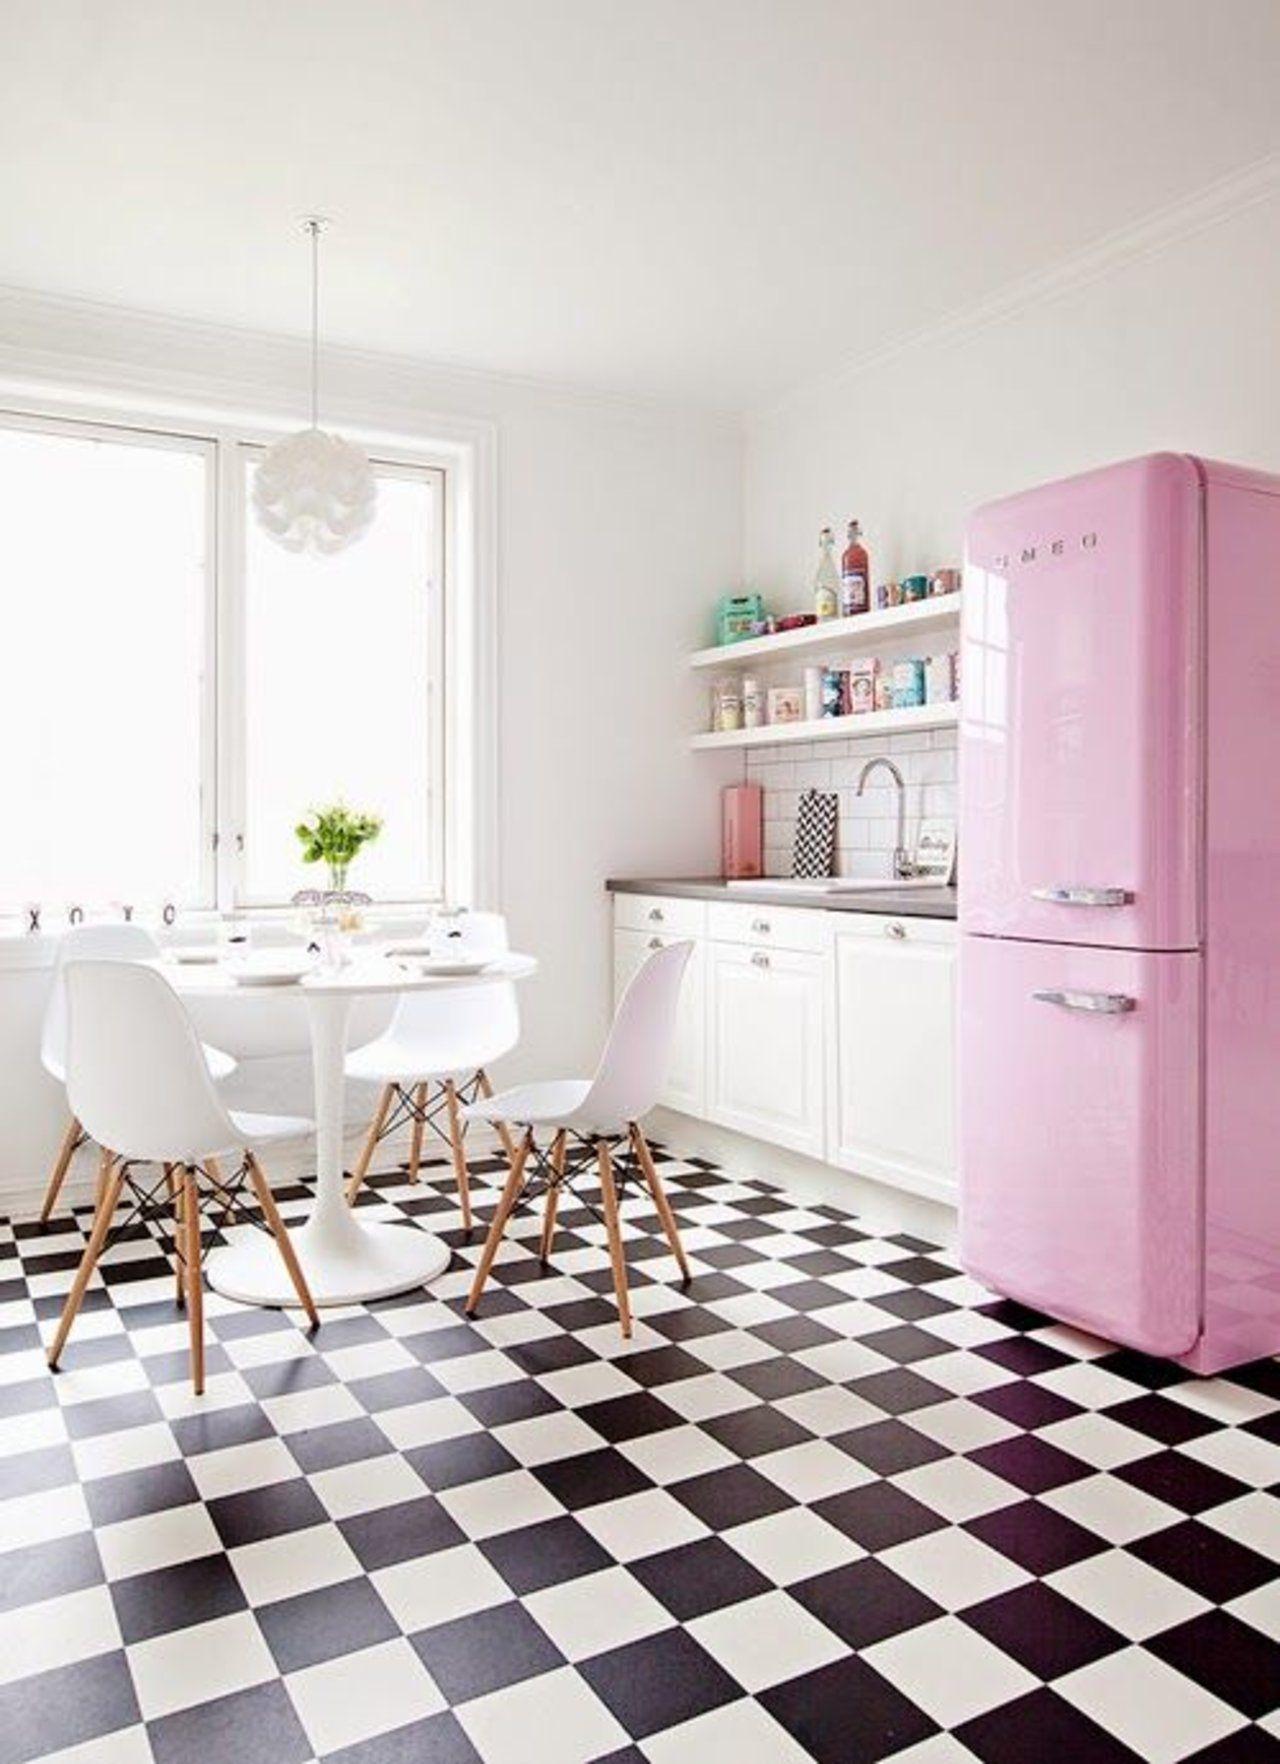 8 Rooms That Prove Smeg Fridges are the Key to a Fabulously Retro ...